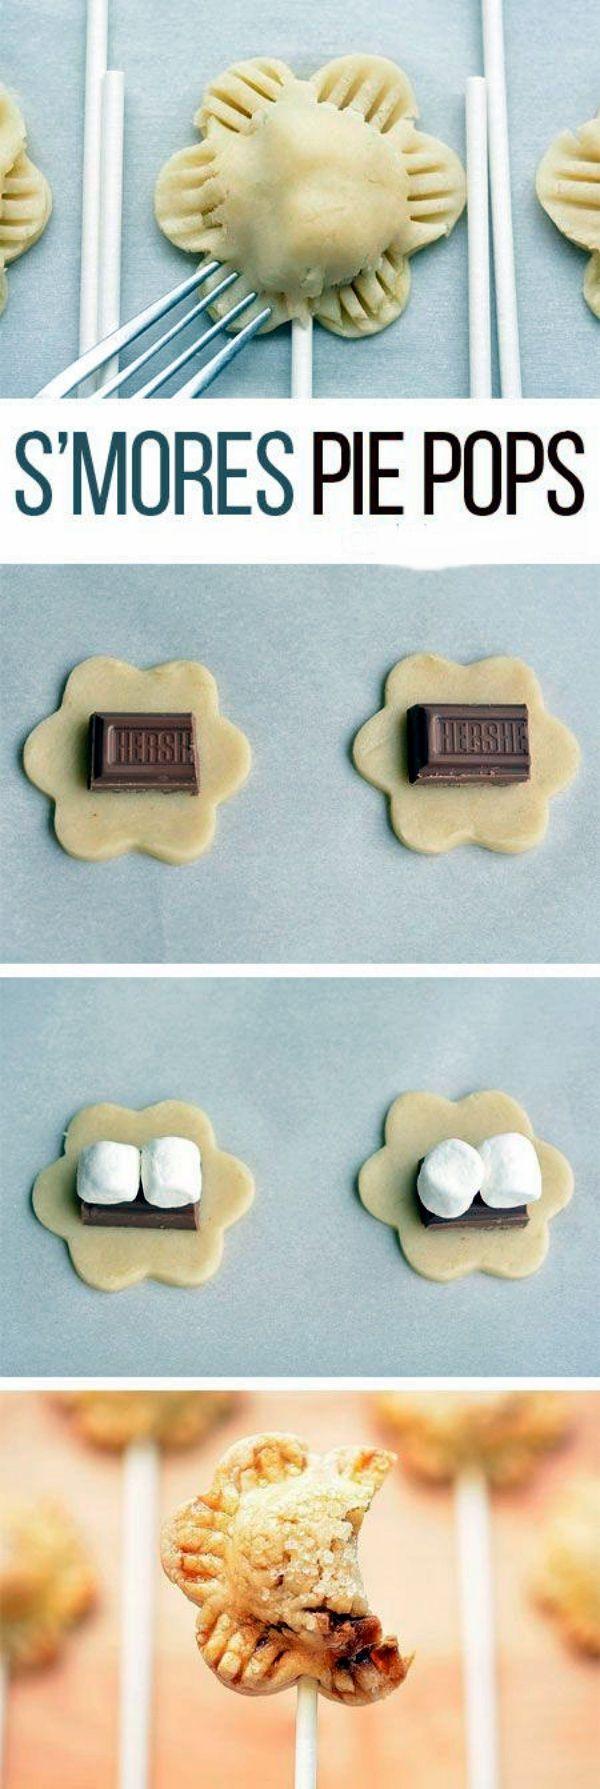 Baking Hacks: Genius DIY Life Hacks For Kitchen | desserts ...